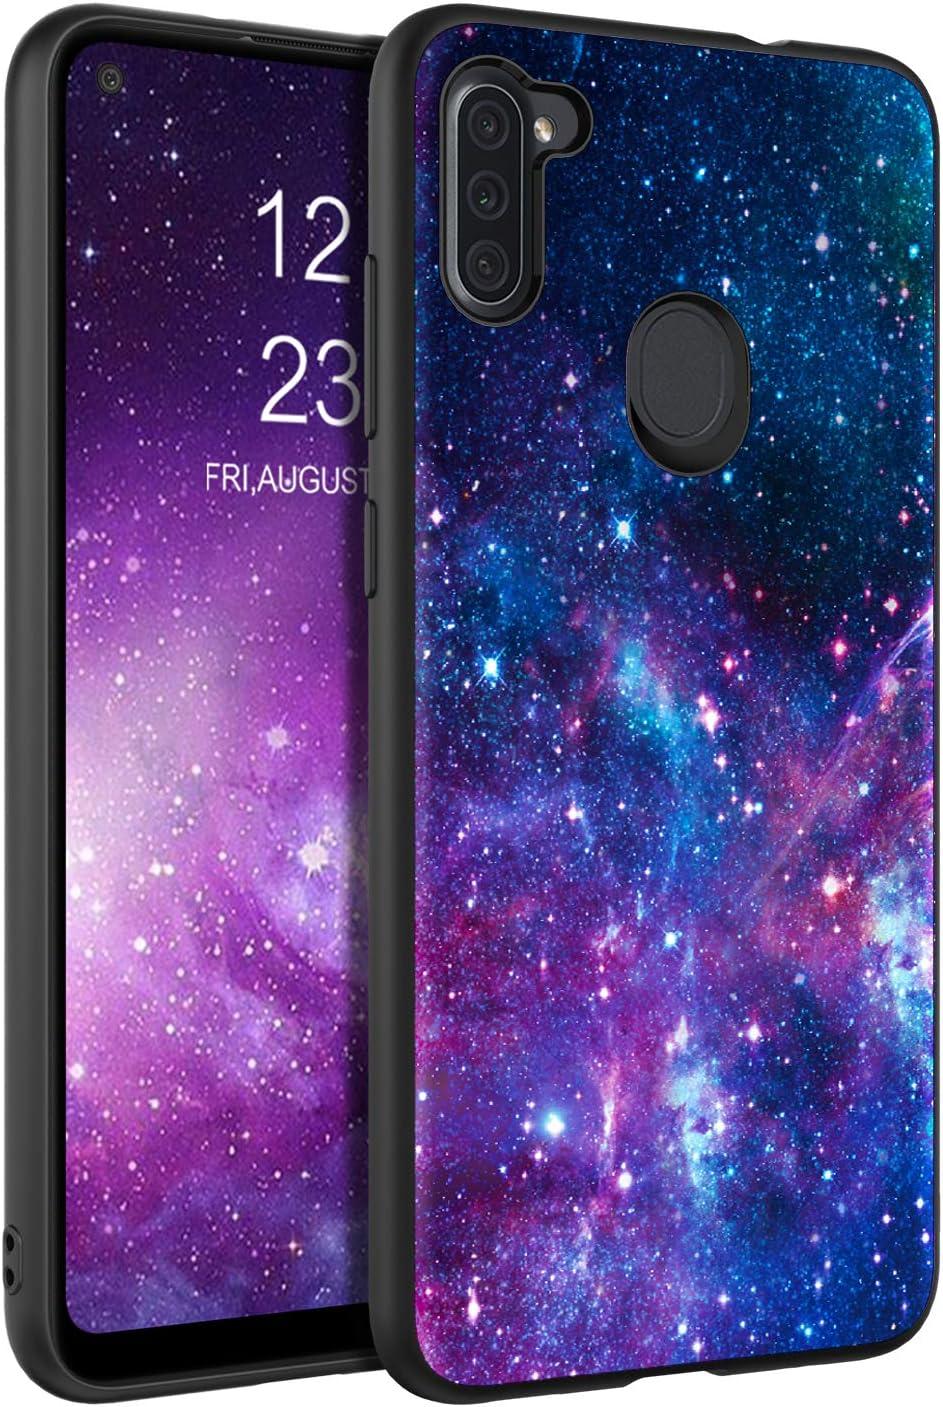 BENTOBEN Samsung Galaxy A11 Case, Slim Fit Glow in The Dark Protective Hybrid Hard PC Soft TPU Bumper Cover Shockproof Phone Cases for Samsung Galaxy A11, Nebula/Galaxy